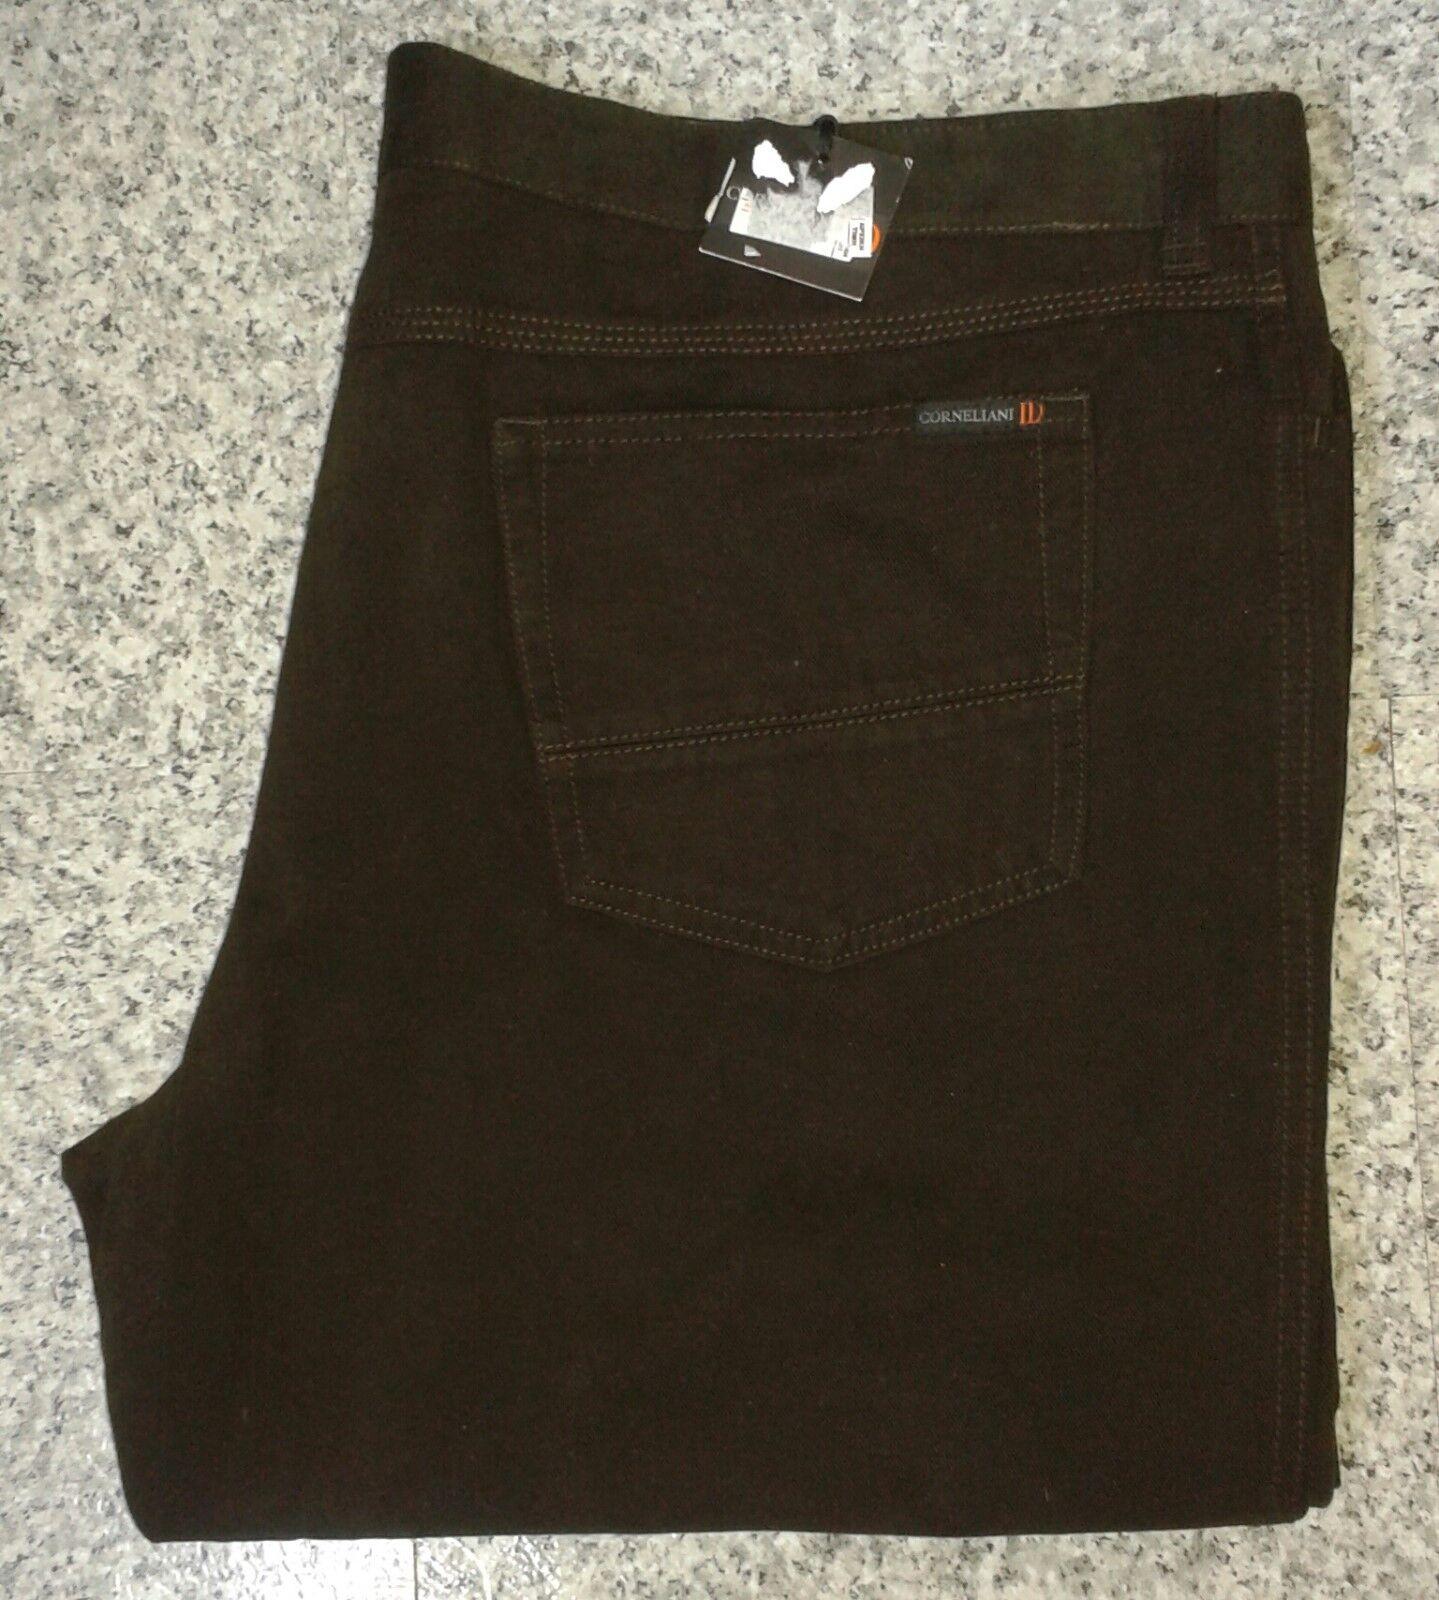 CORNELIANI ID Pants Pantaloni Marronee Scuro-W43 L34, W39 L34